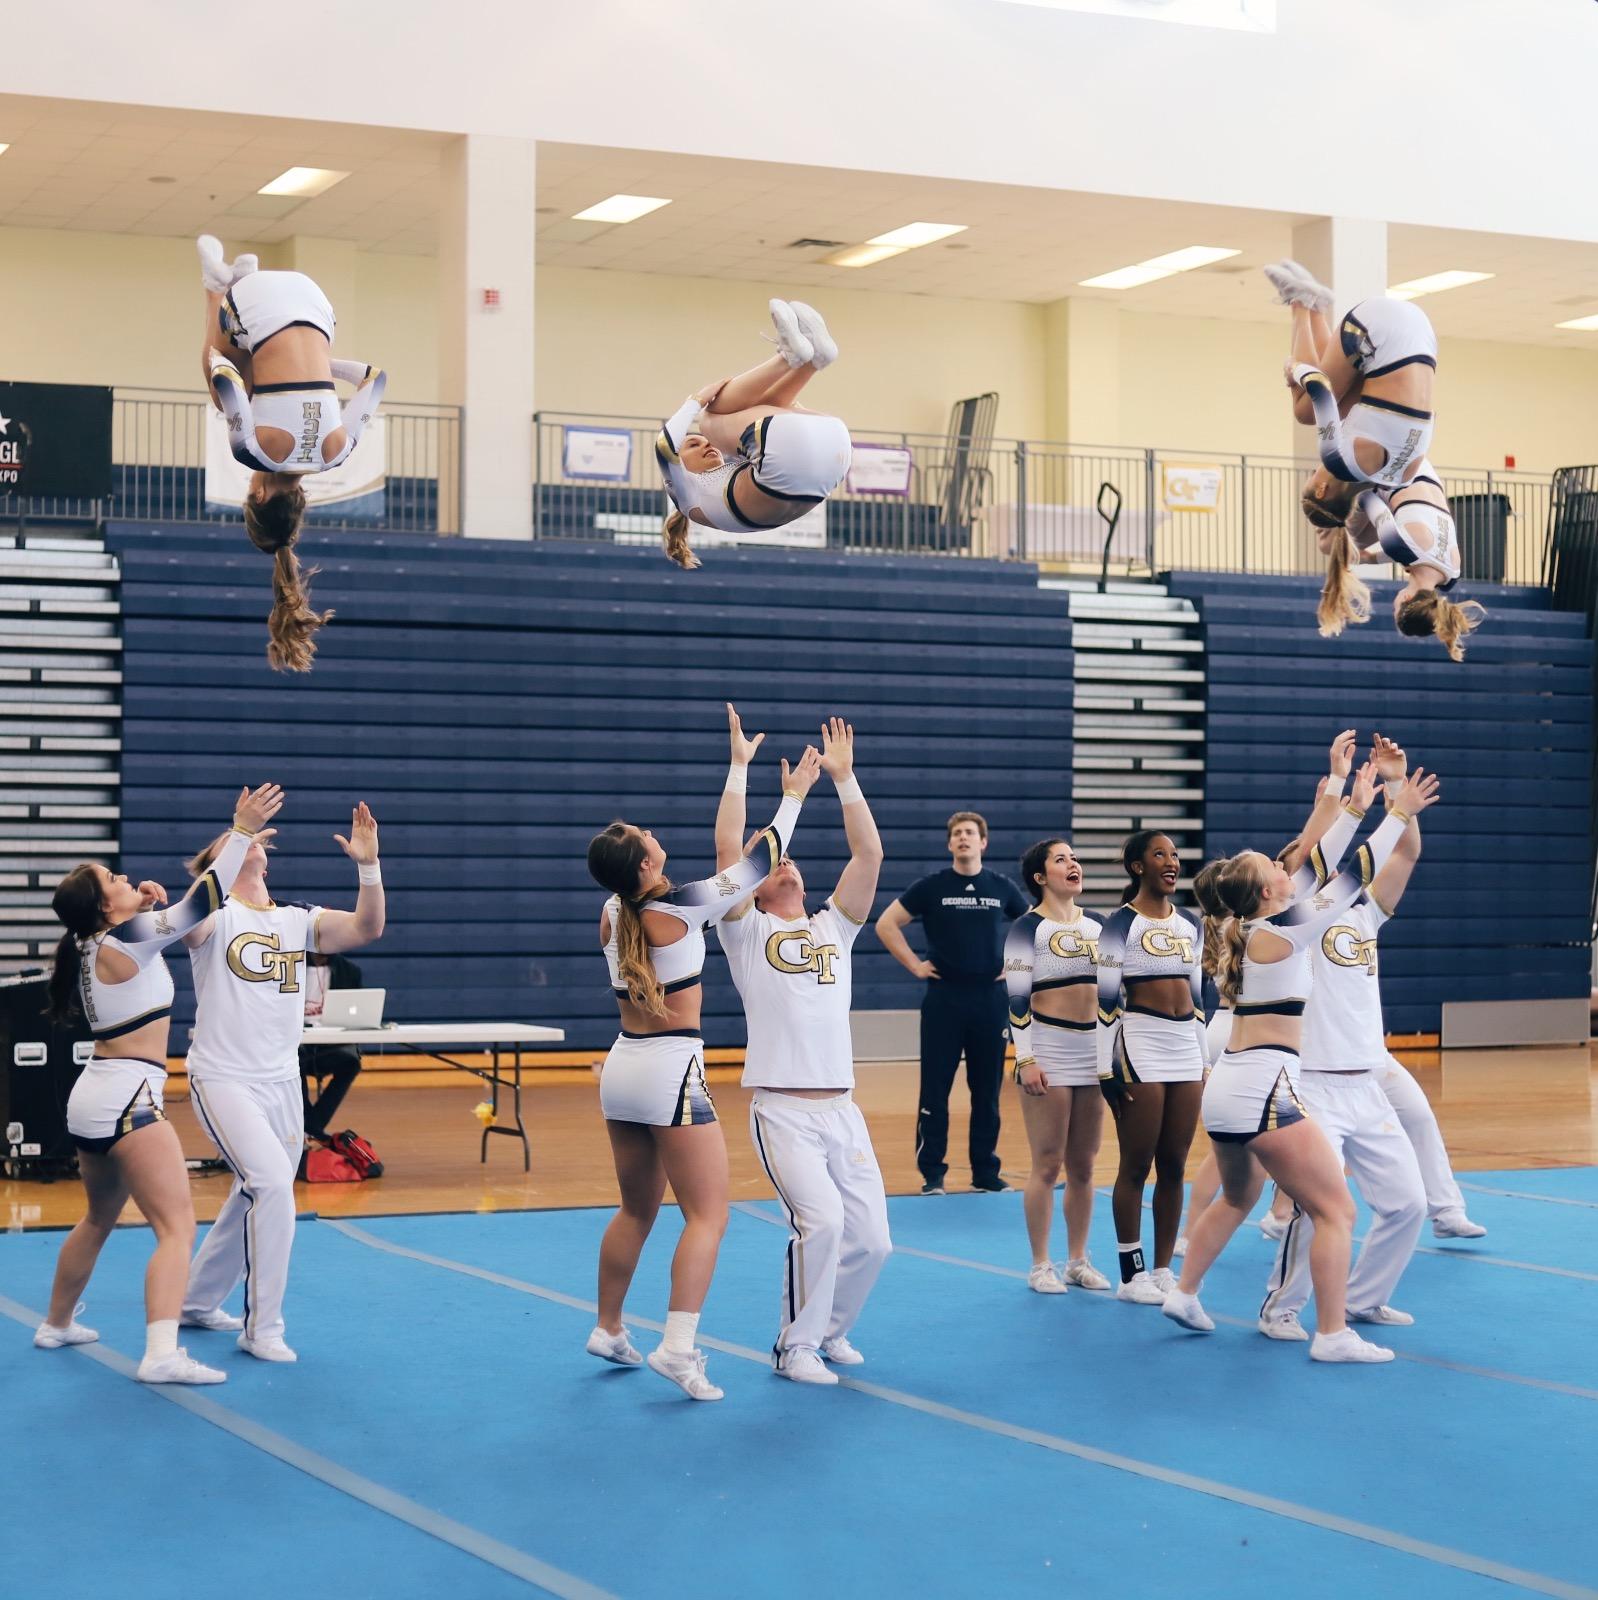 GA Tech Cheerleading at CenterStage